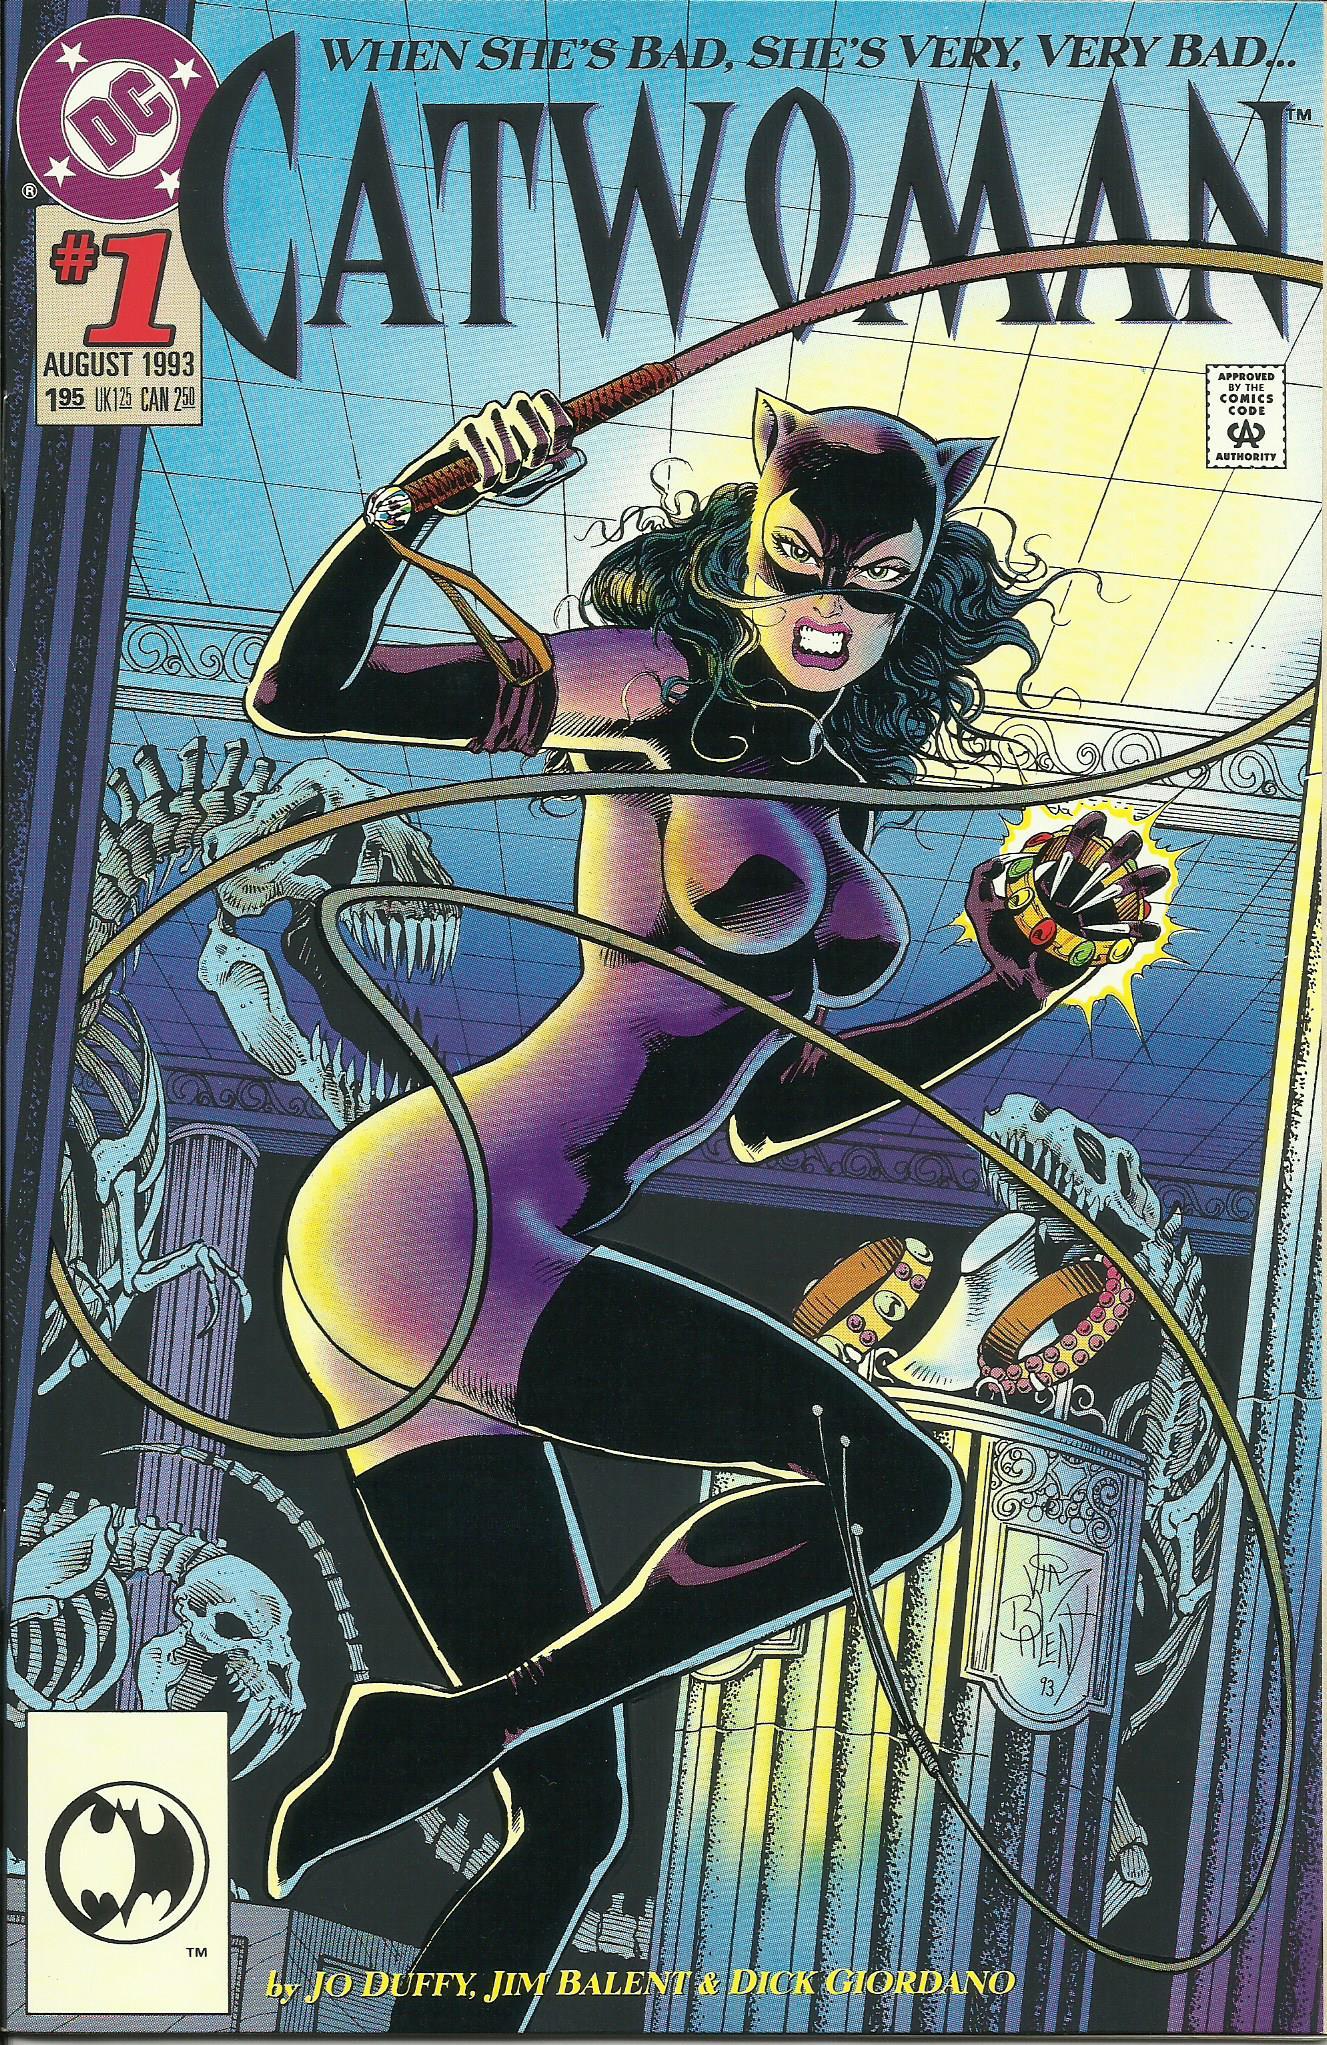 Catwoman Vol 2 1